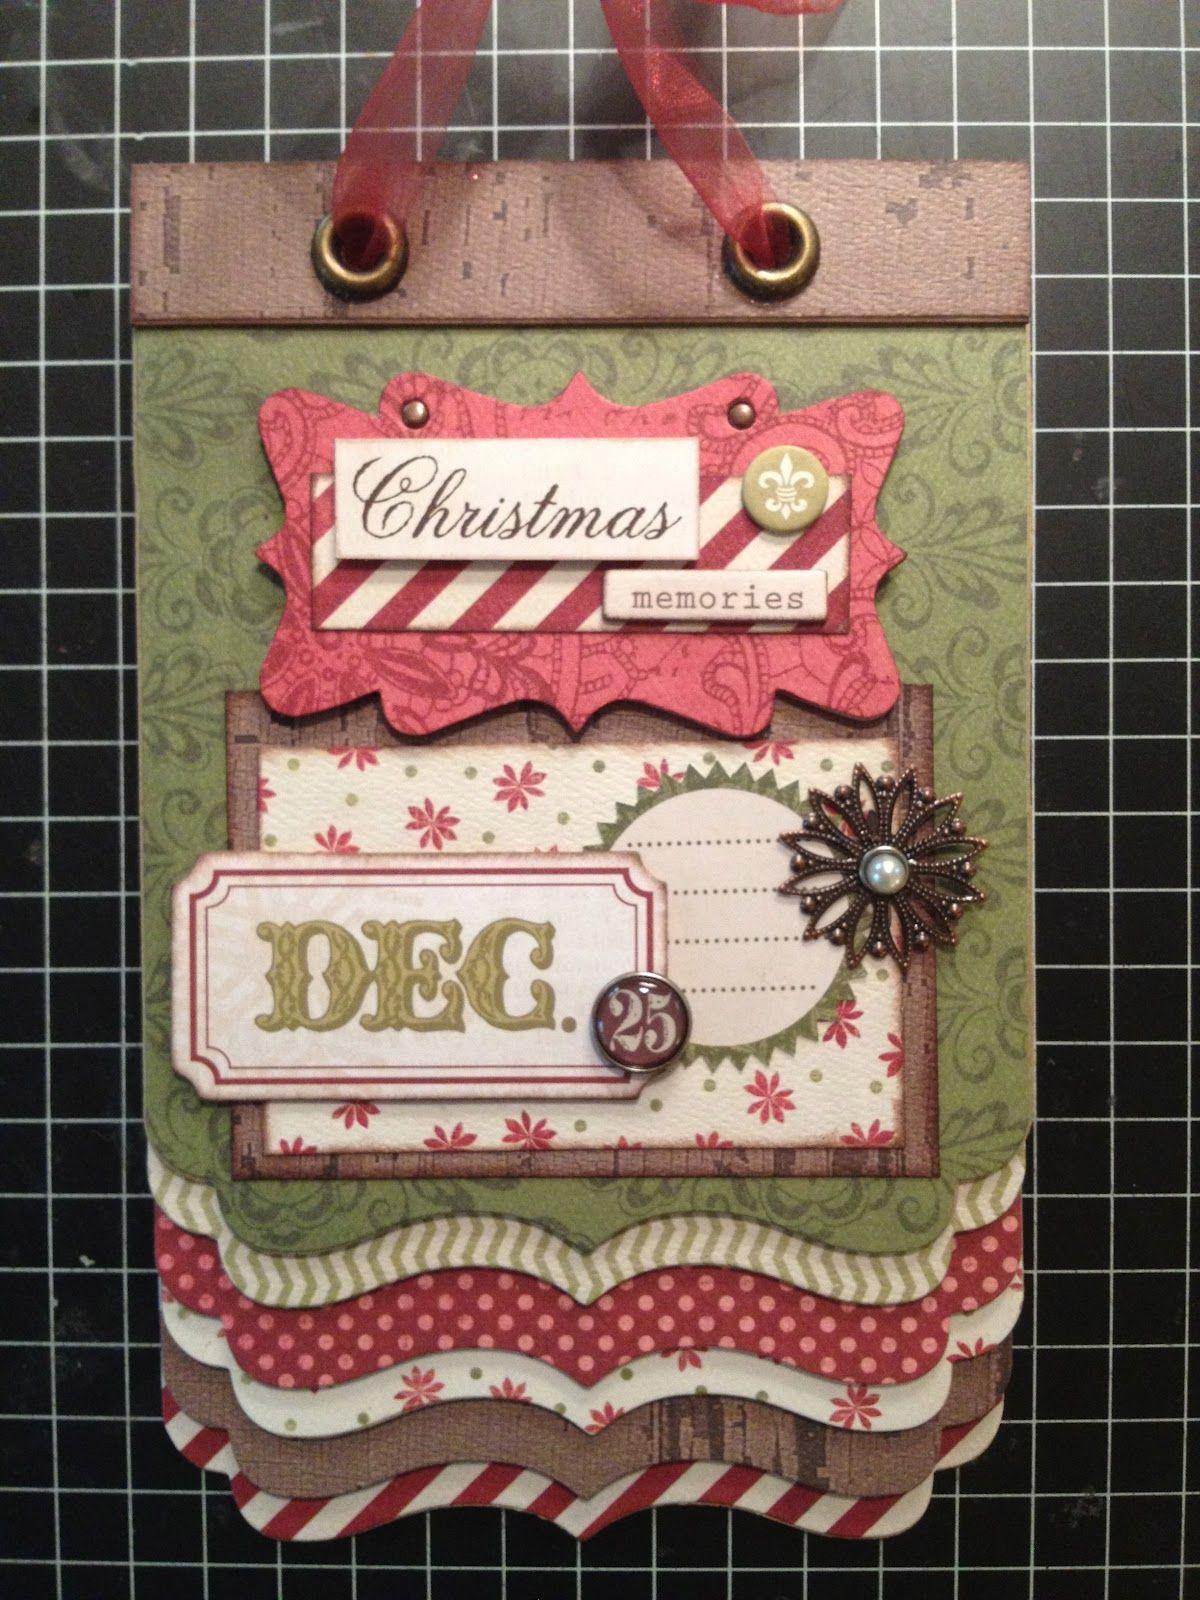 Scrapbook ideas christmas card - Artsy Albums Scrapbooking Kits Custom Designed Scrapbook Albums By Traci Penrod